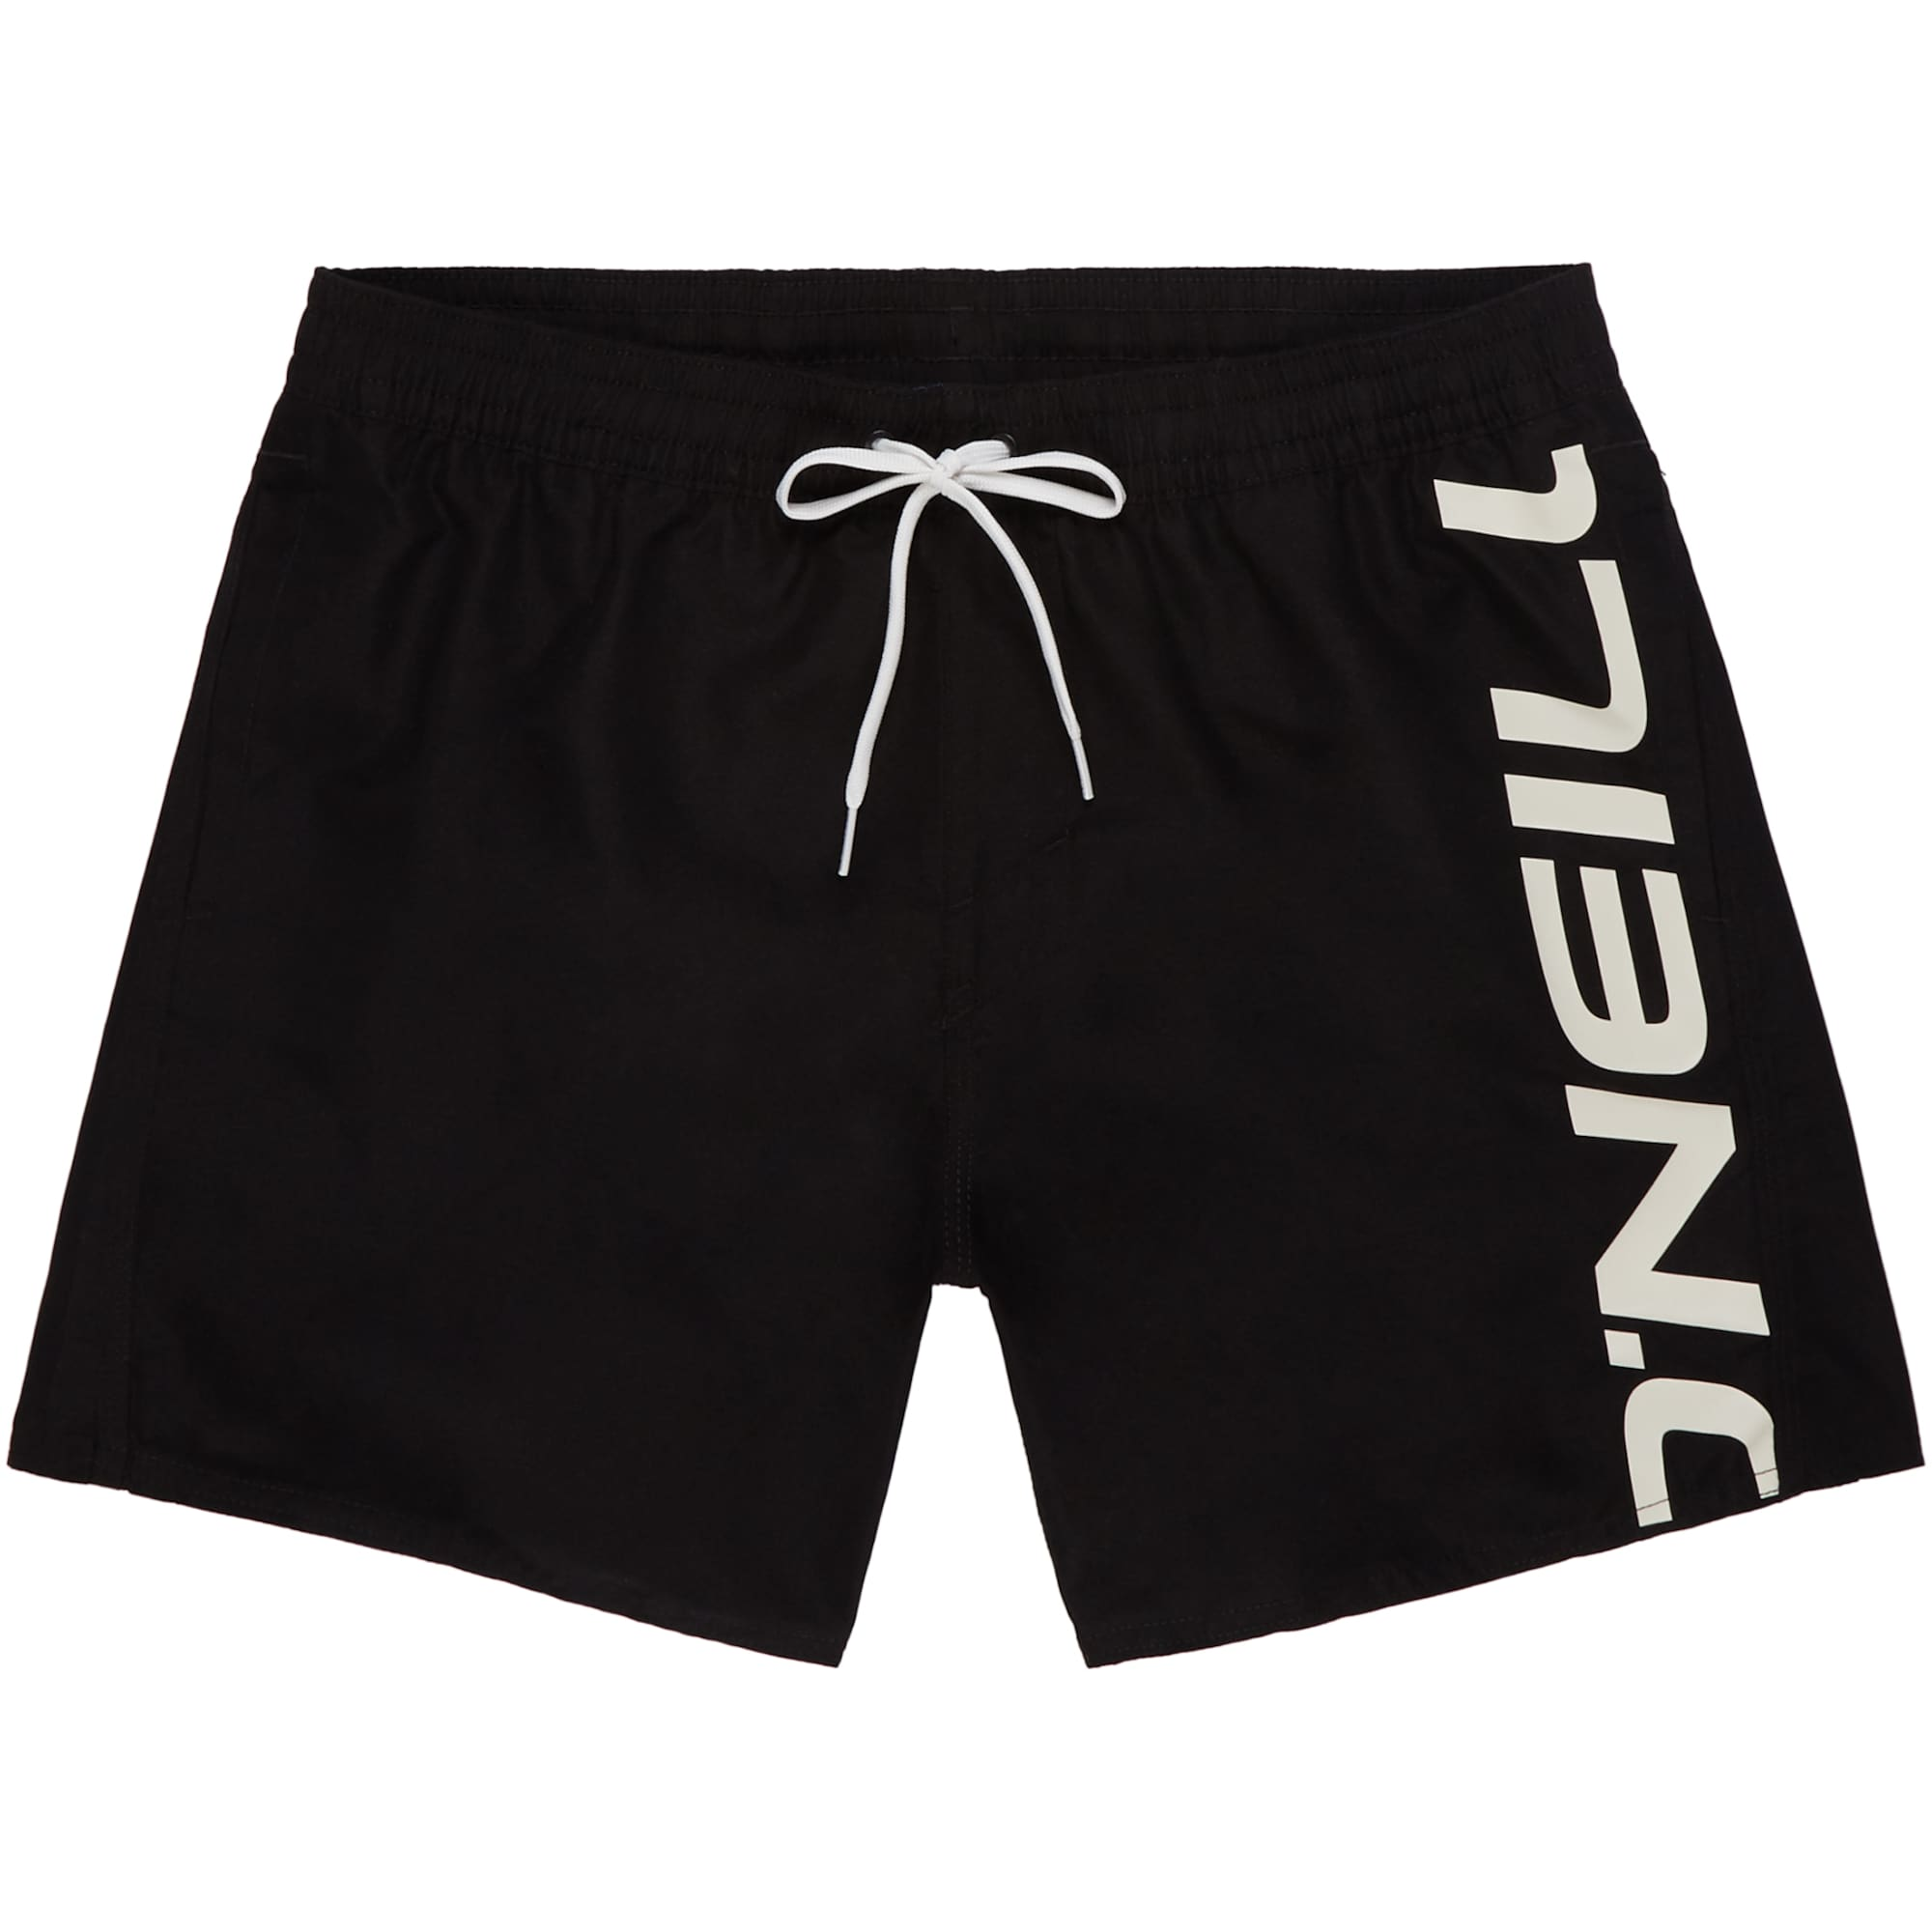 ONEILL Plavecké šortky černá přírodní bílá O'NEILL